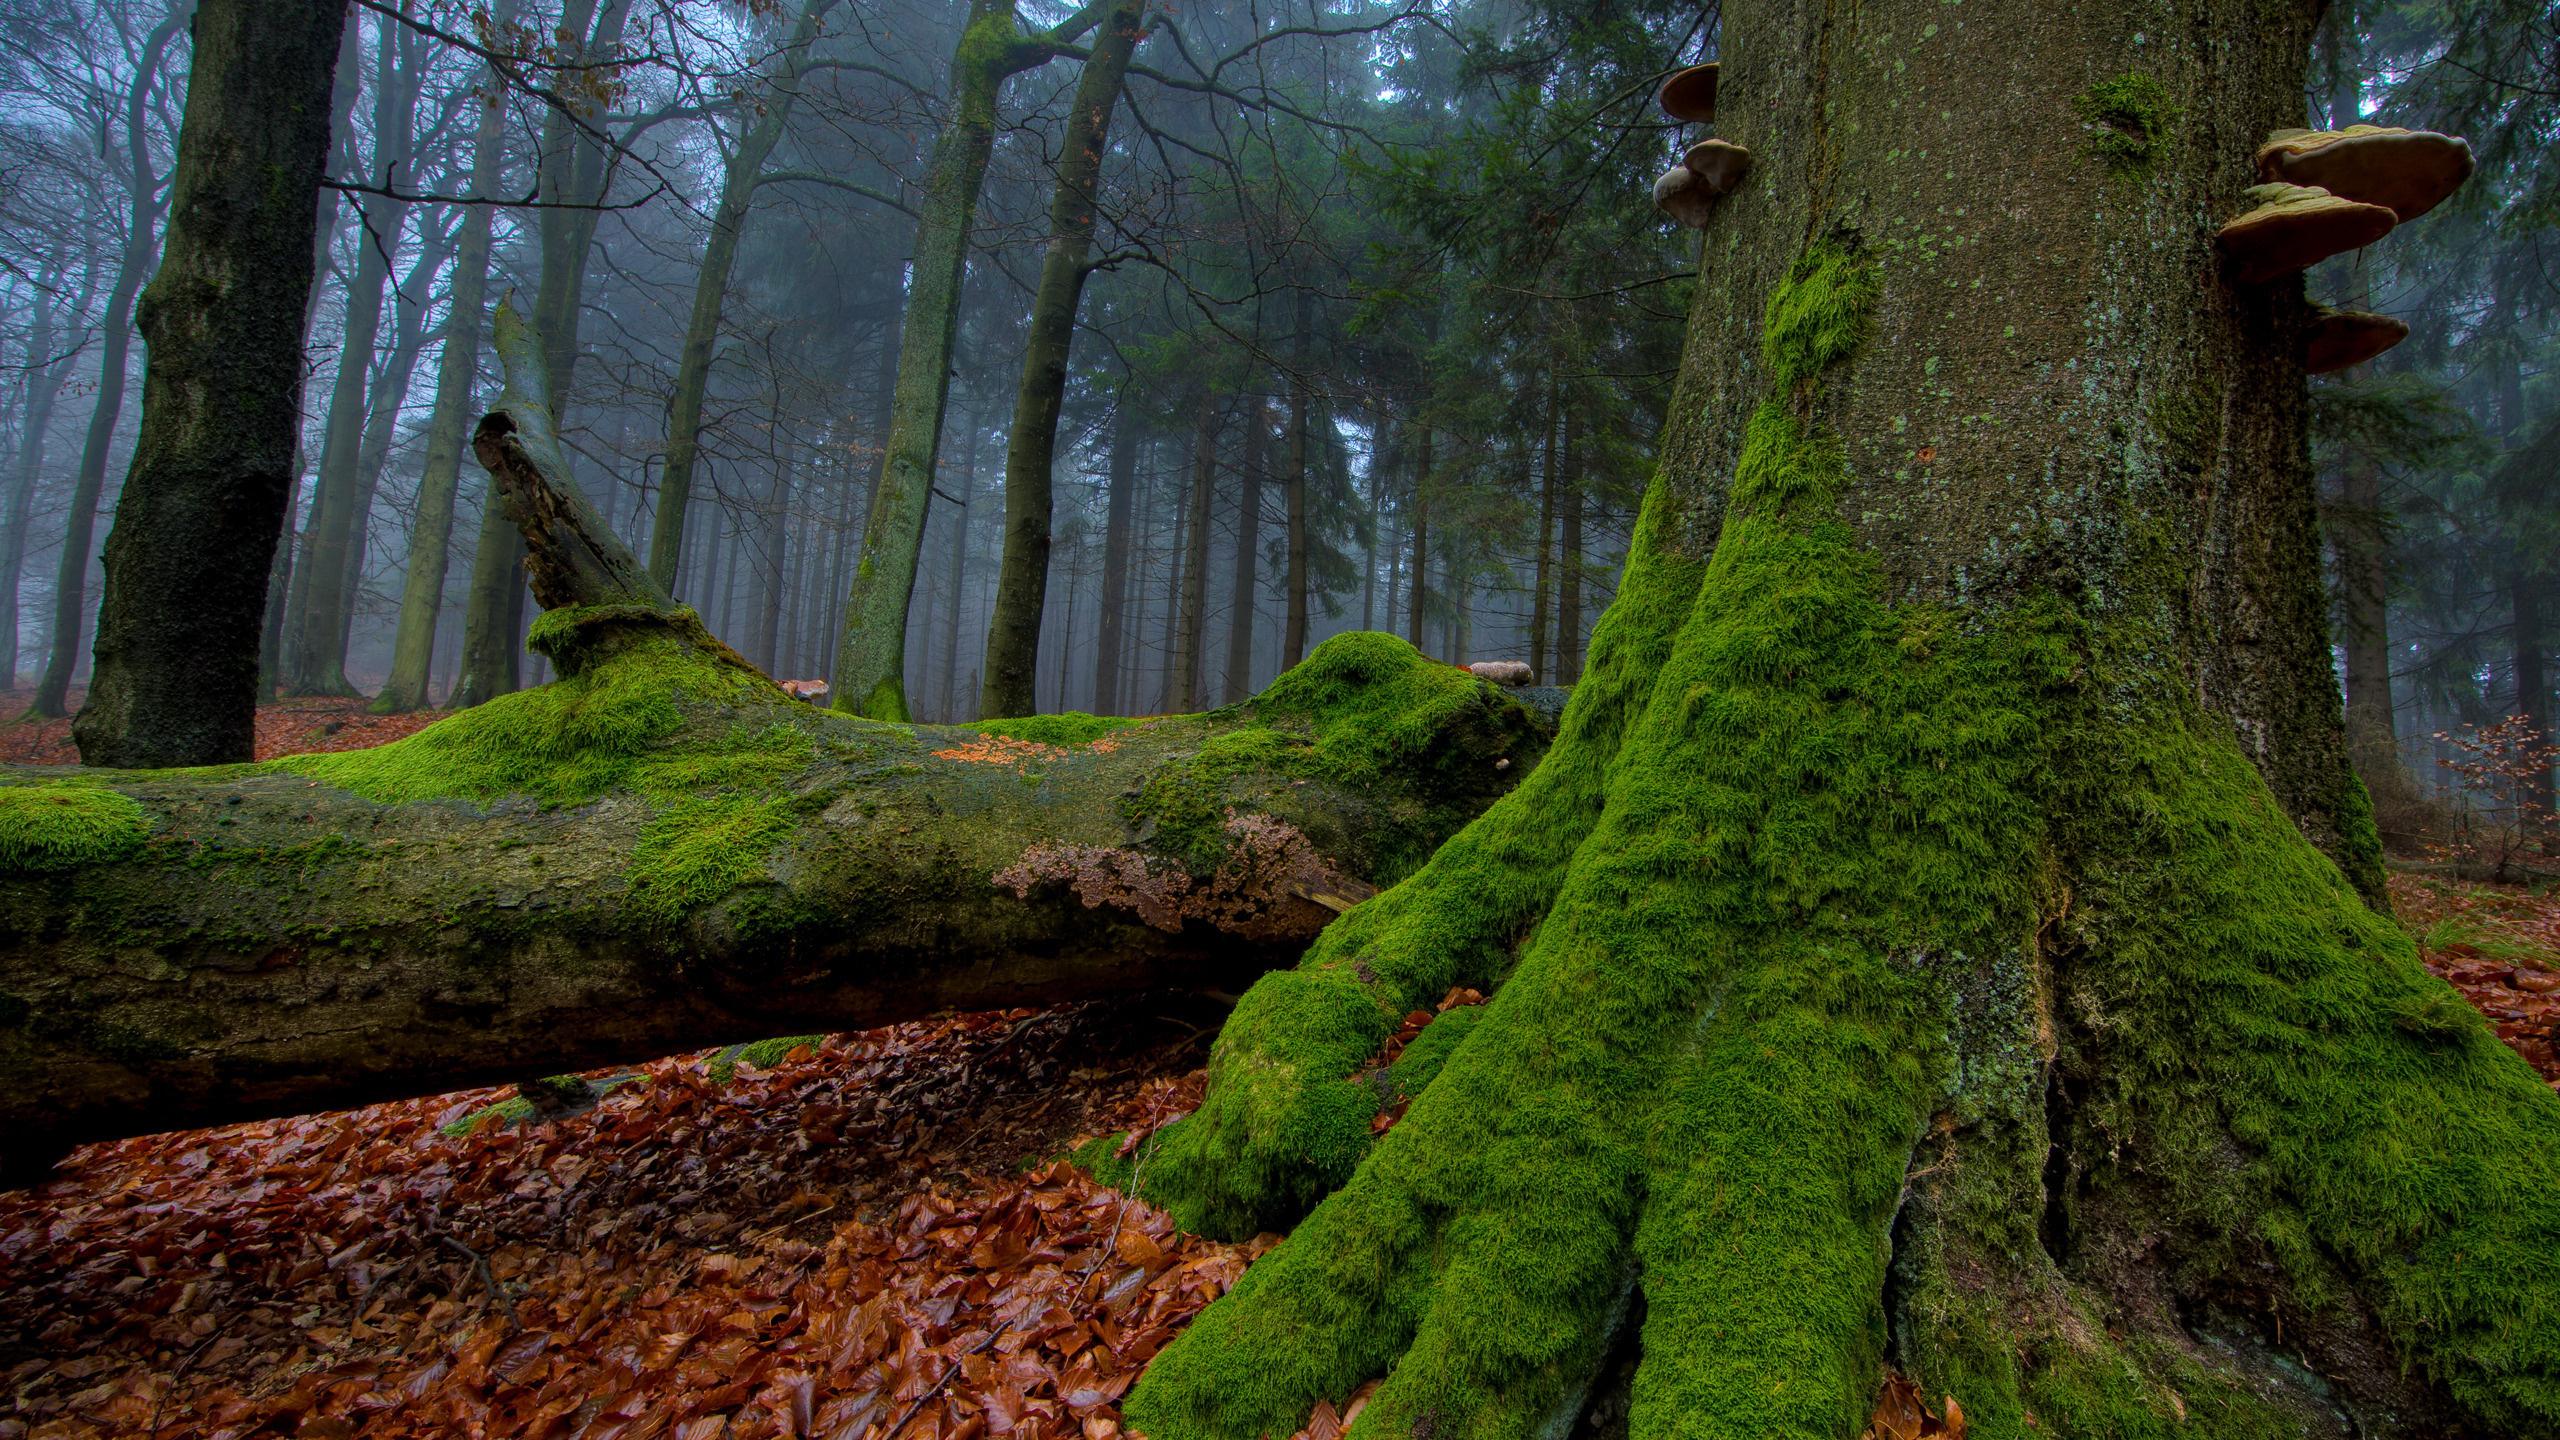 природа деревья графика лес nature trees graphics forest без смс